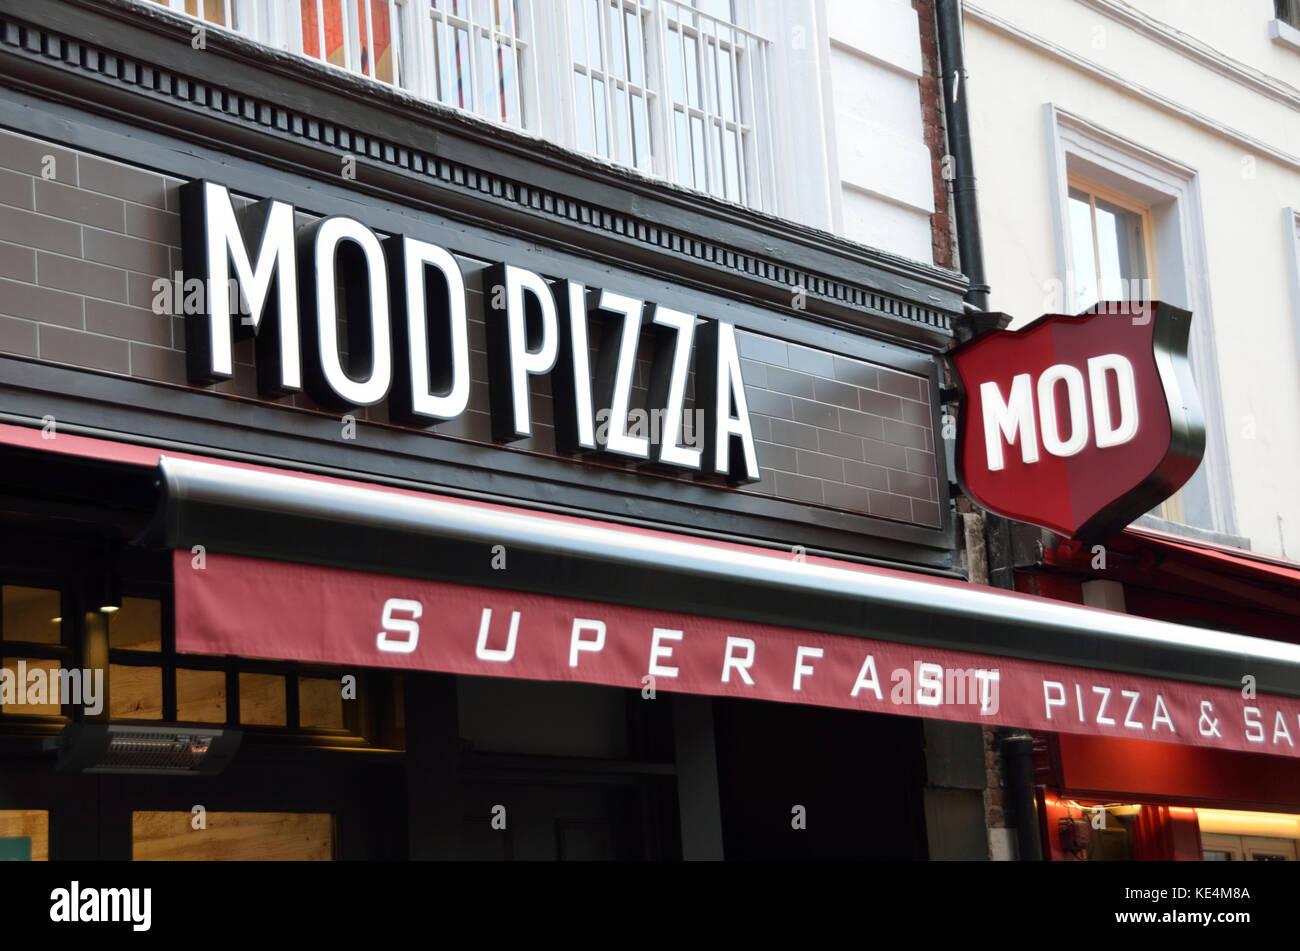 Mod Pizza Takeaway London Uk Stock Photo 163602218 Alamy